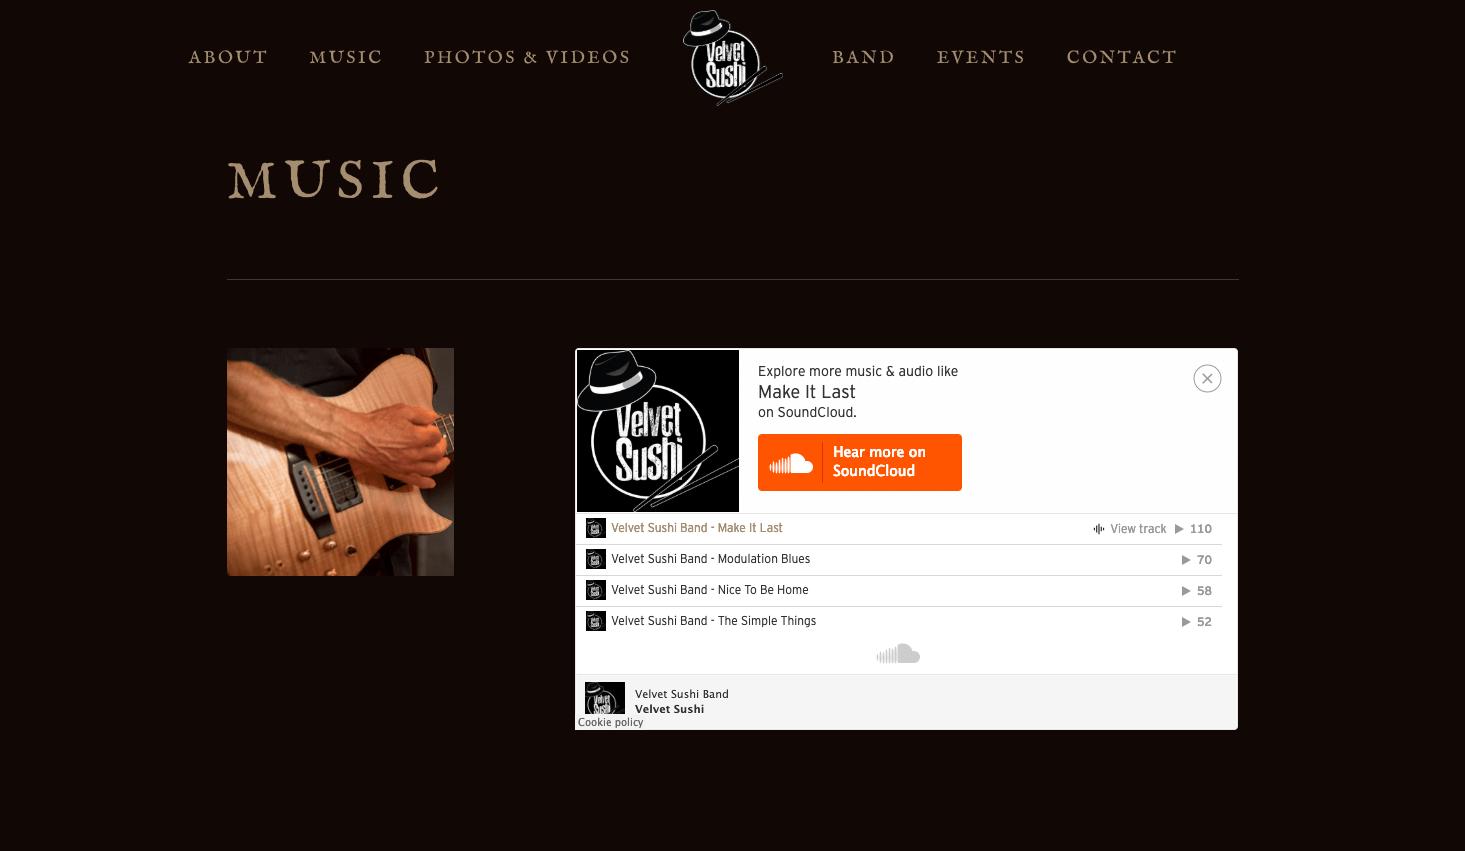 Velvet-Sushi-Jazz-Band-Website-Design-Music-Page